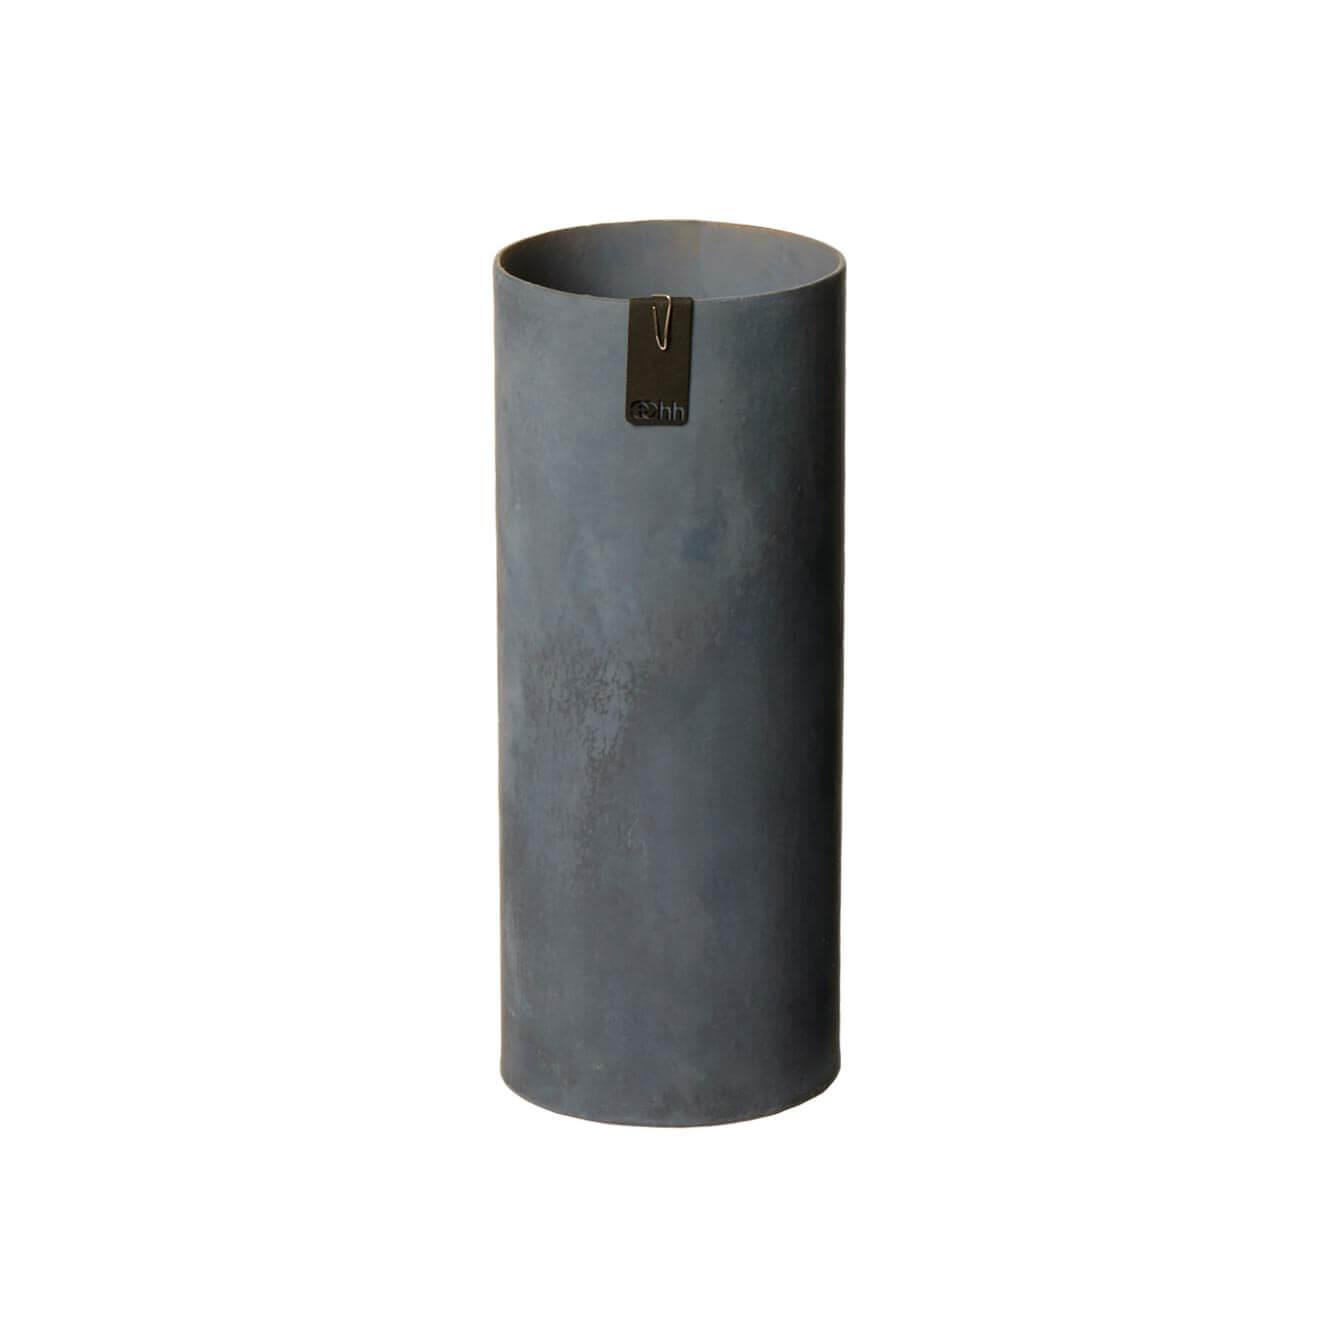 OOhh Kollektion – Vase Tokyo Cylinder – Dunkelgrau